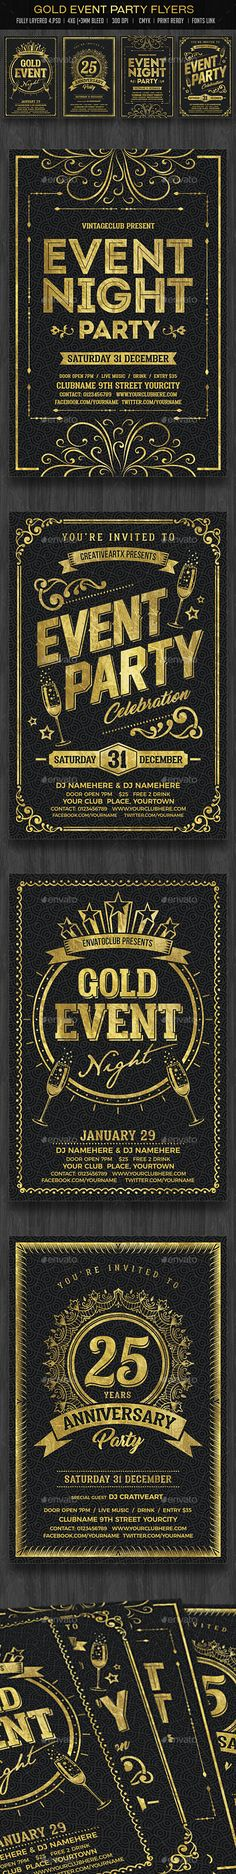 Gold Event Flyers Template PSD Set